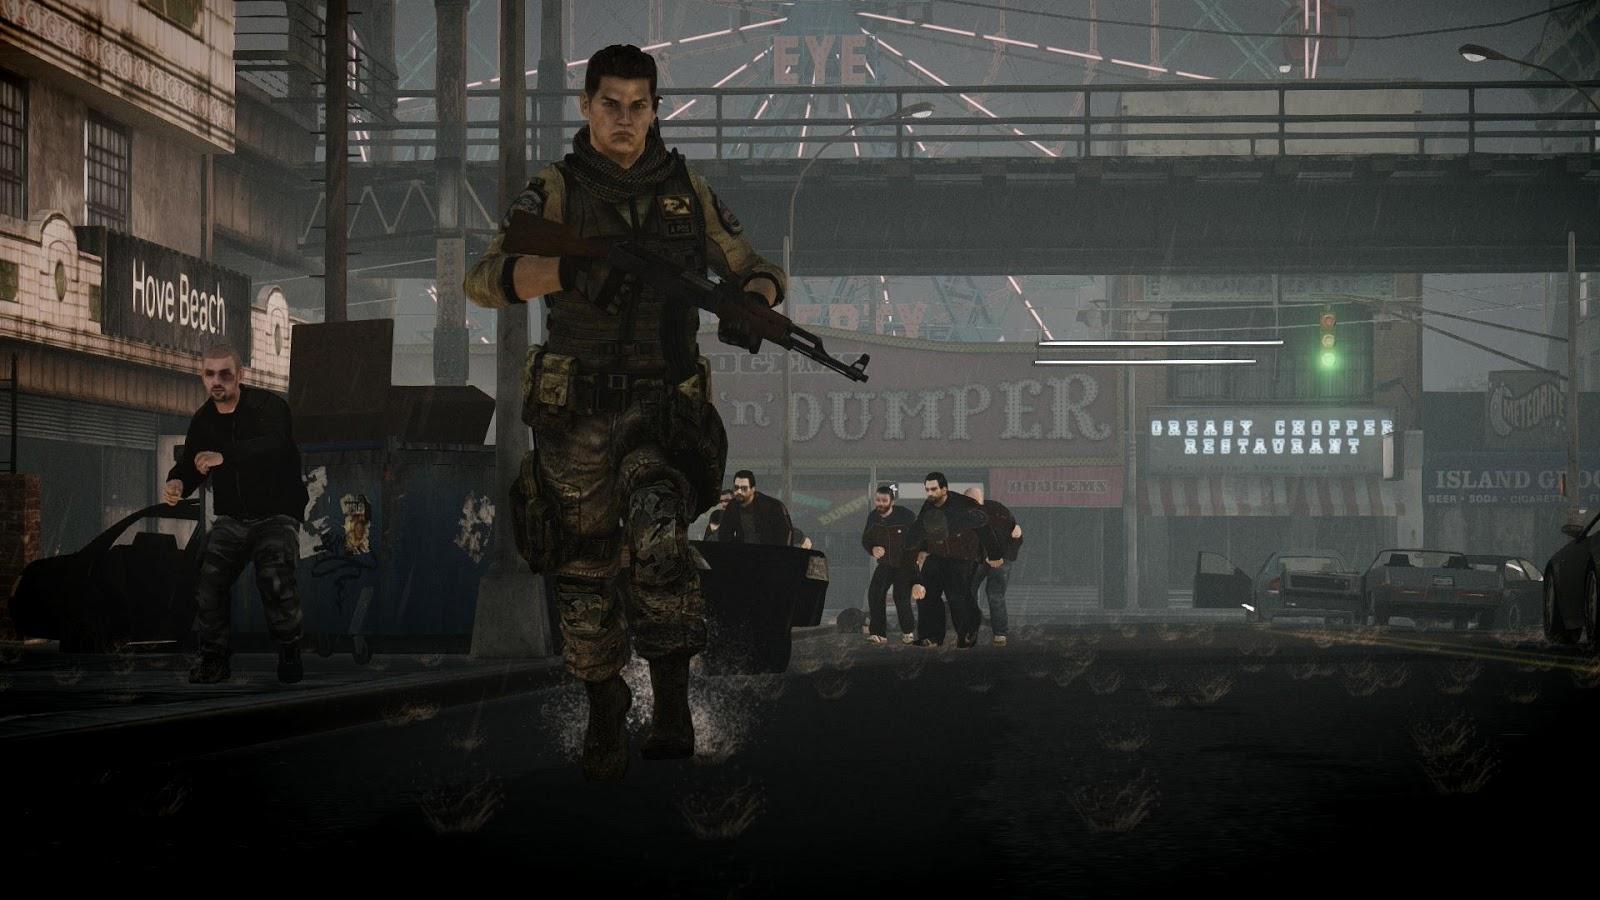 Ada wong resident evil mod - 2 3